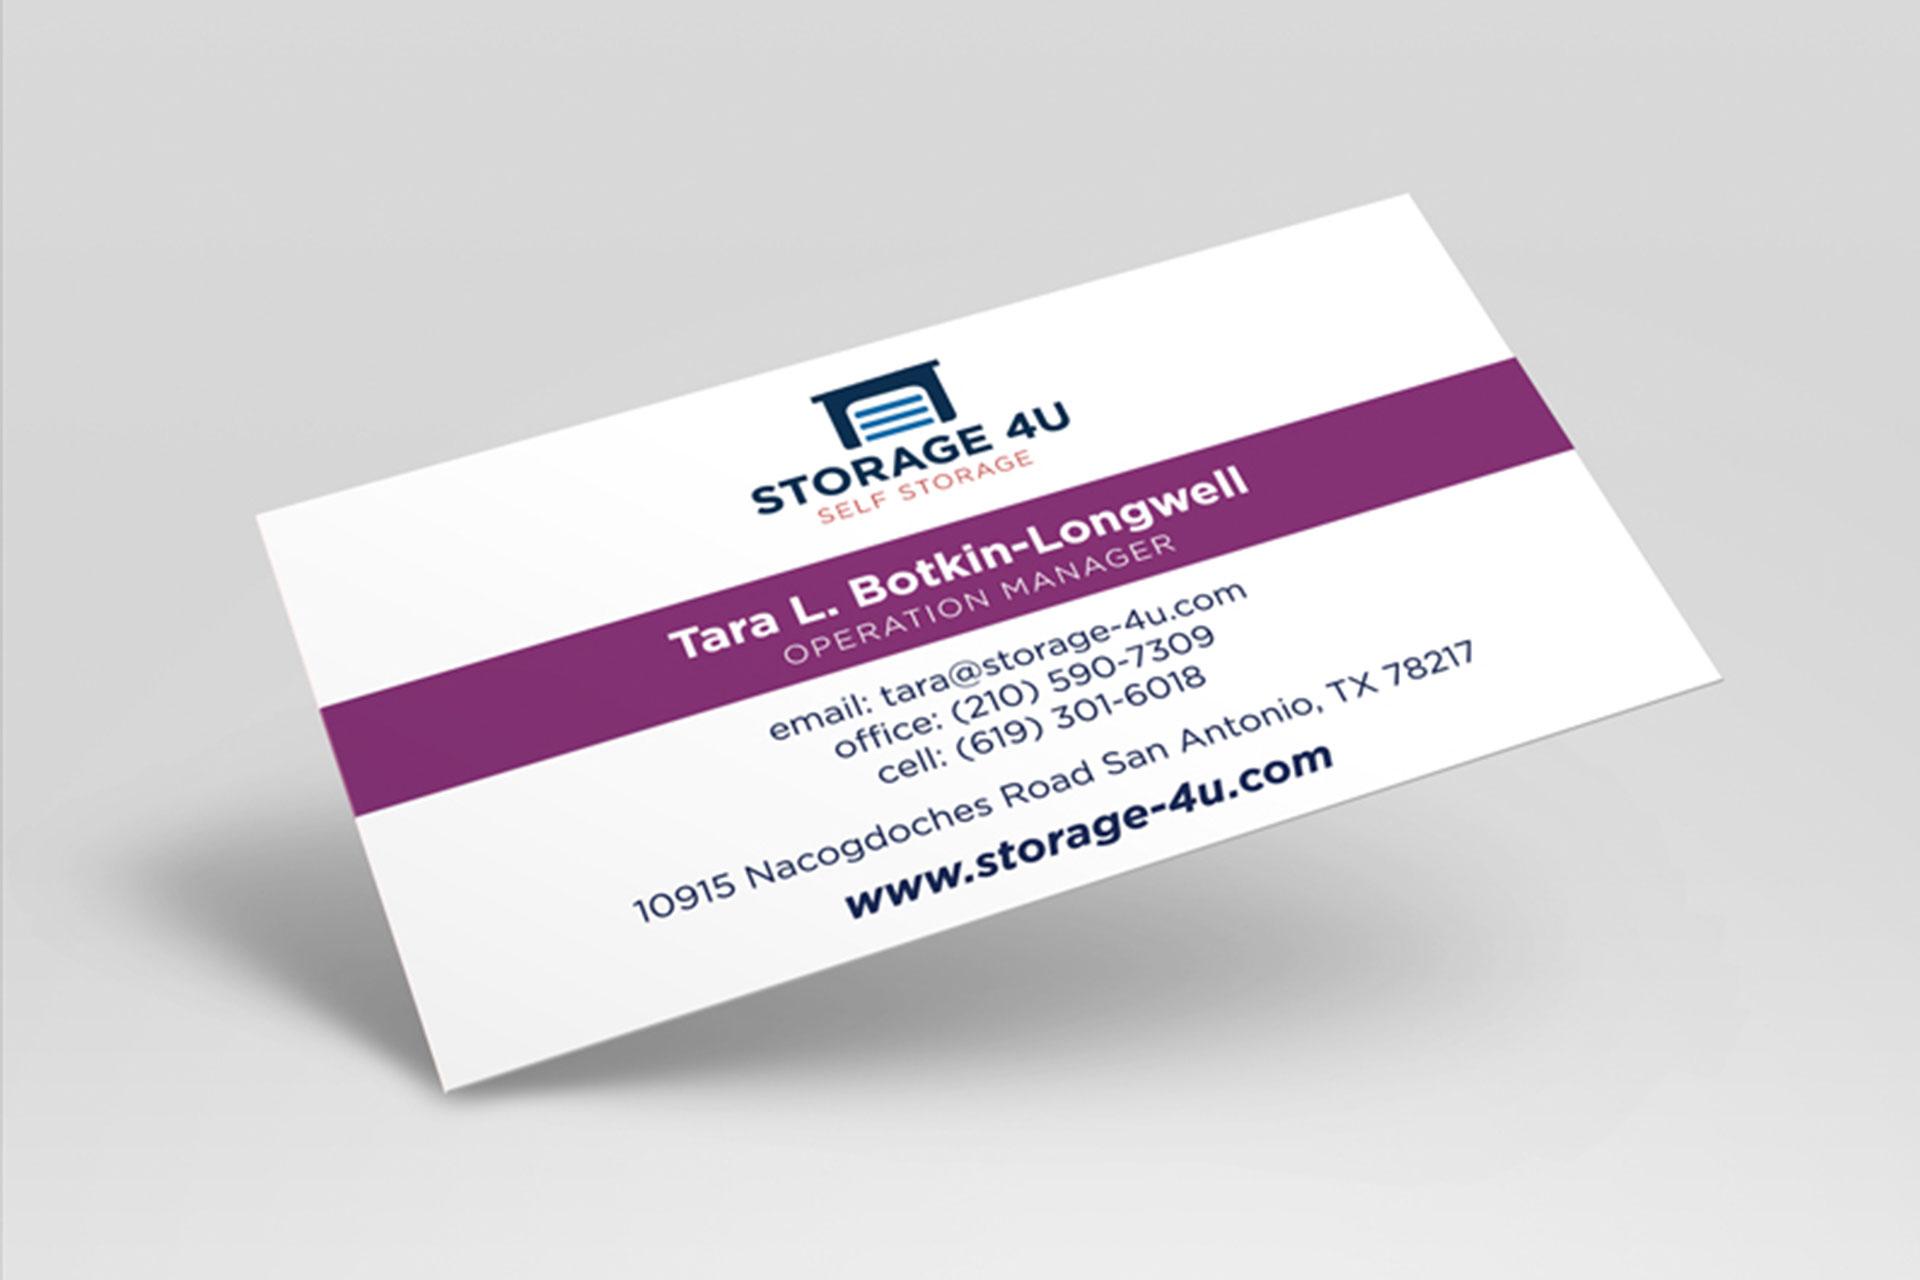 Storage 4U Self Storage business card